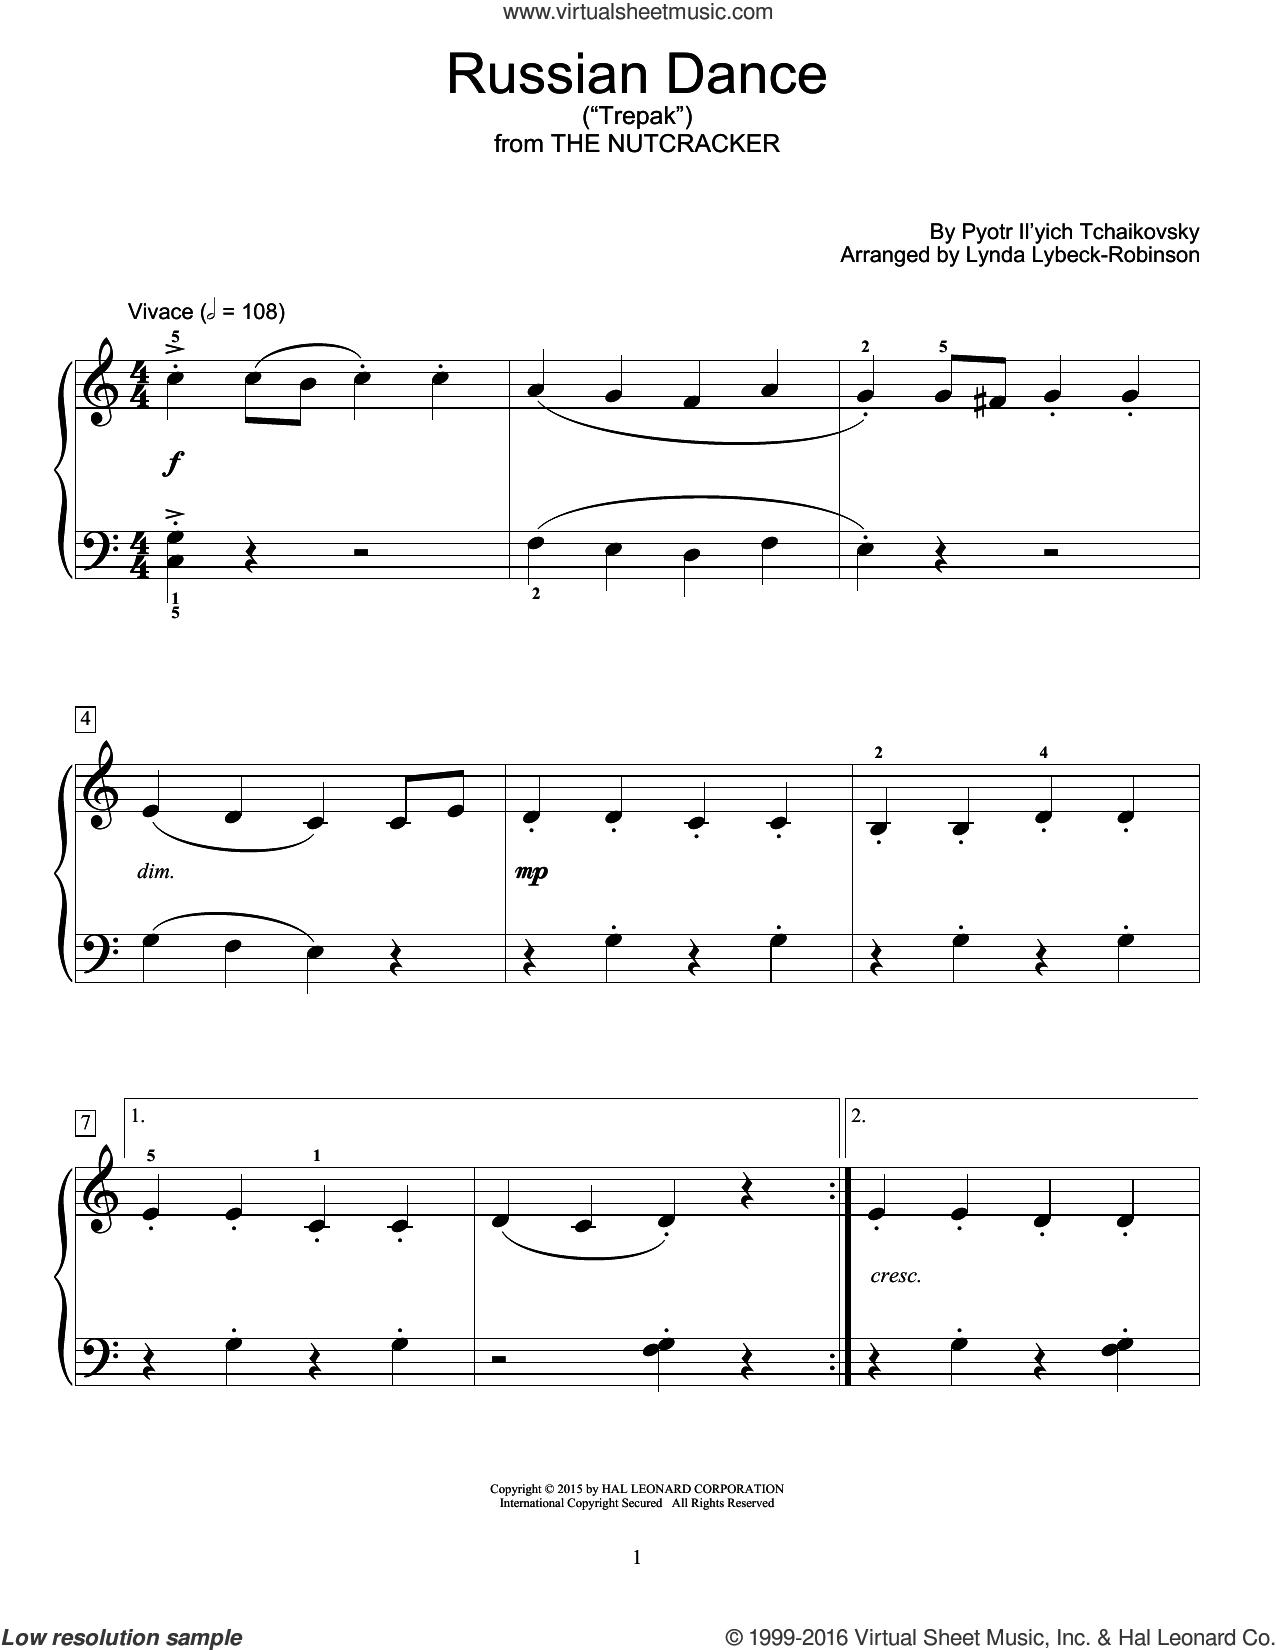 Russian Dance ('Trepak') sheet music for piano solo (elementary) by Pyotr Ilyich Tchaikovsky and Lynda Lybeck-Robinson, classical score, beginner piano (elementary)